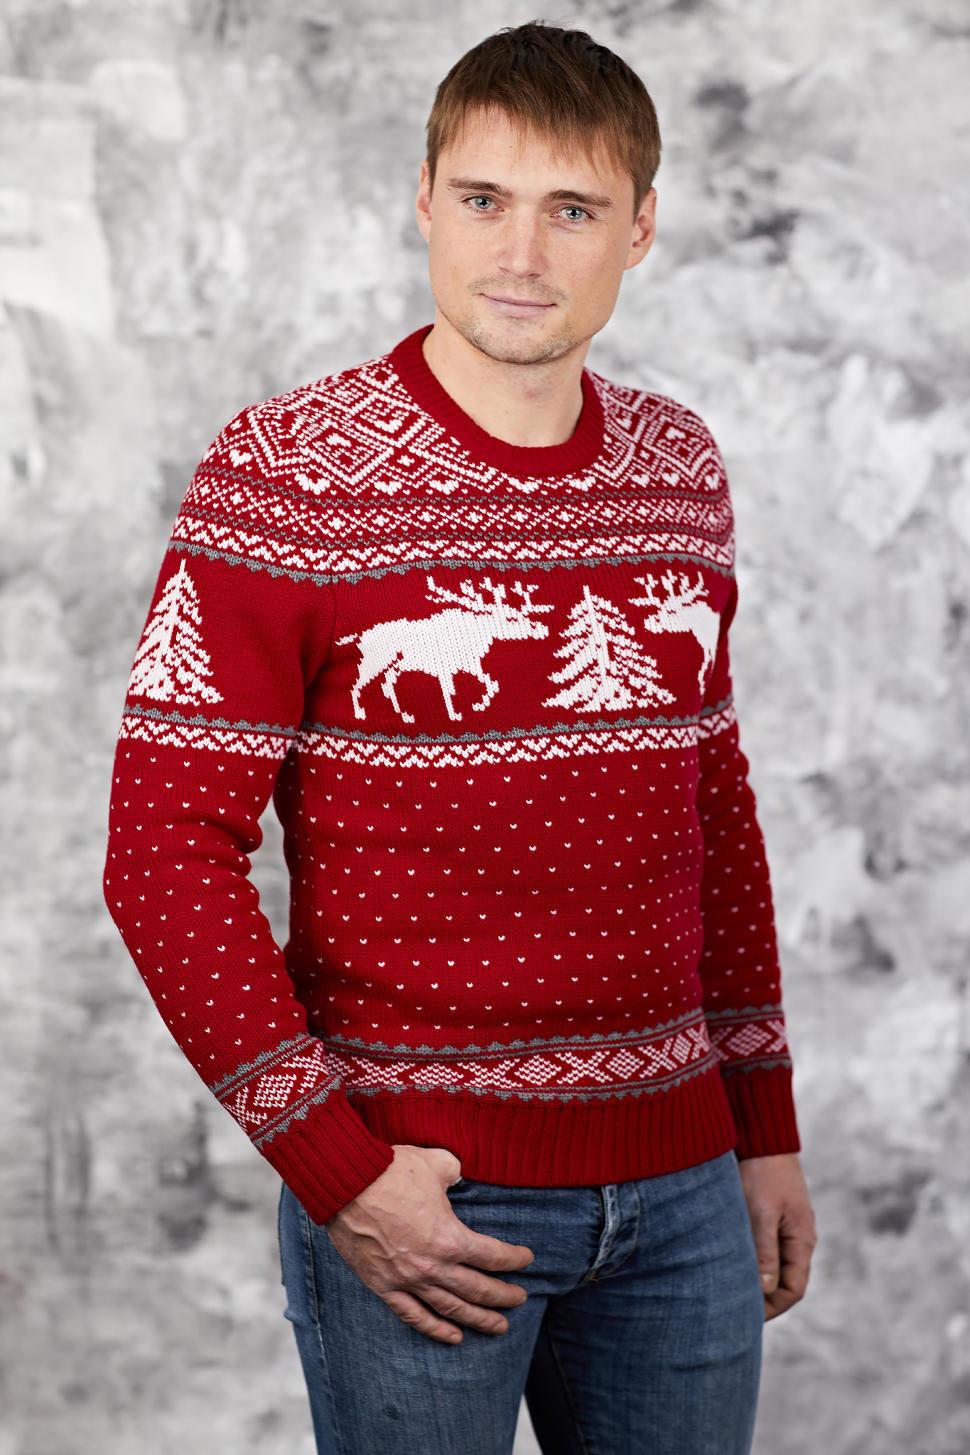 будет картинки на свитер с оленемер талантливого